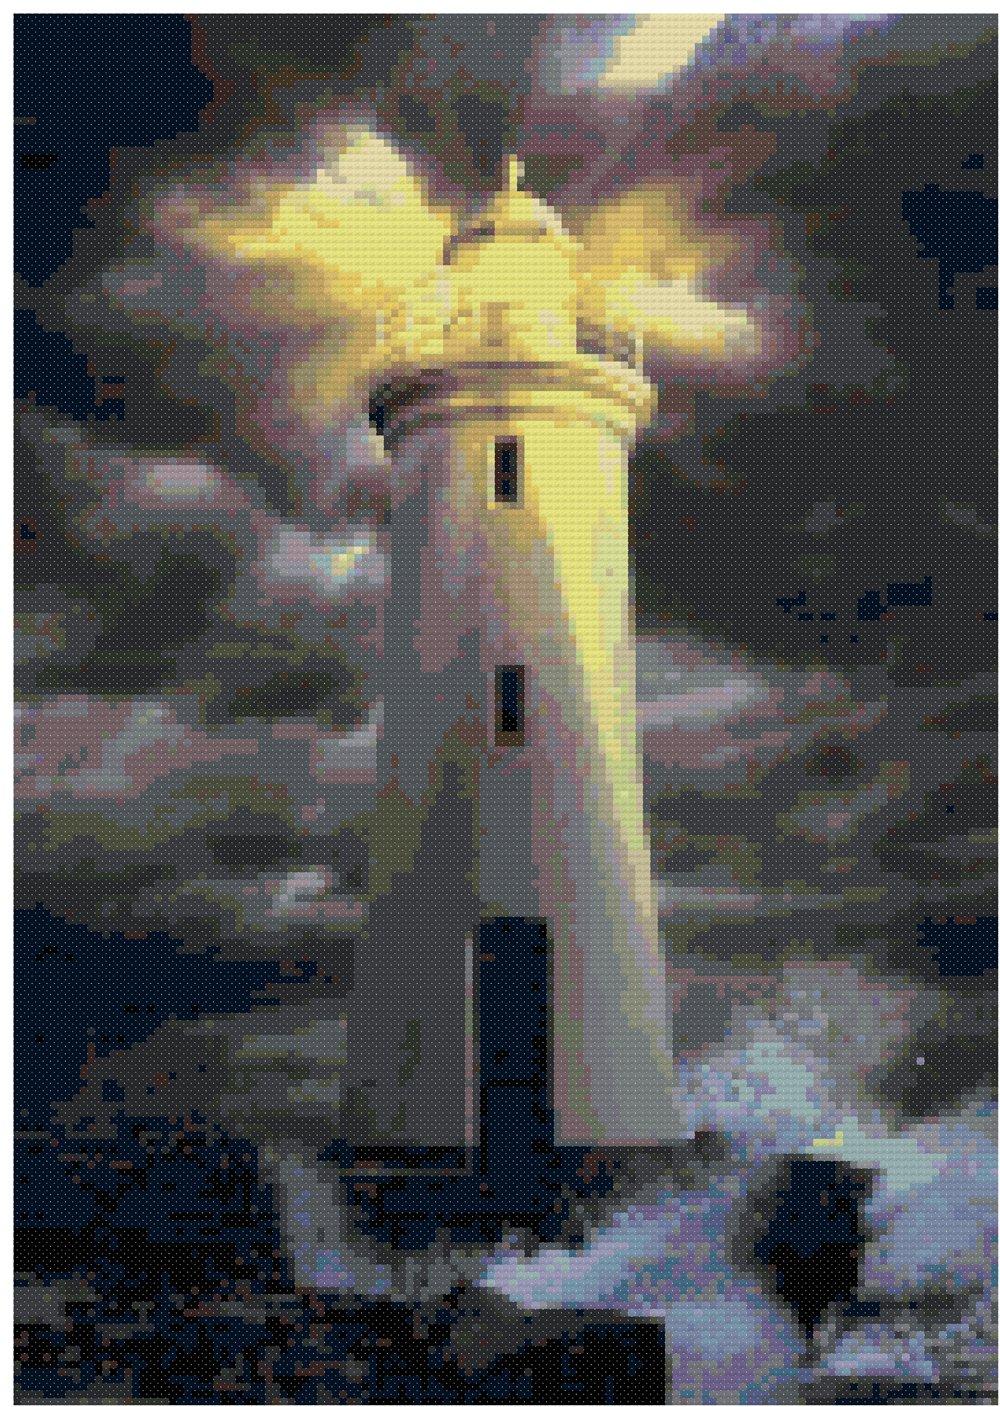 Lighthouse At Night Nautical Counted Cross Stitch Pattern